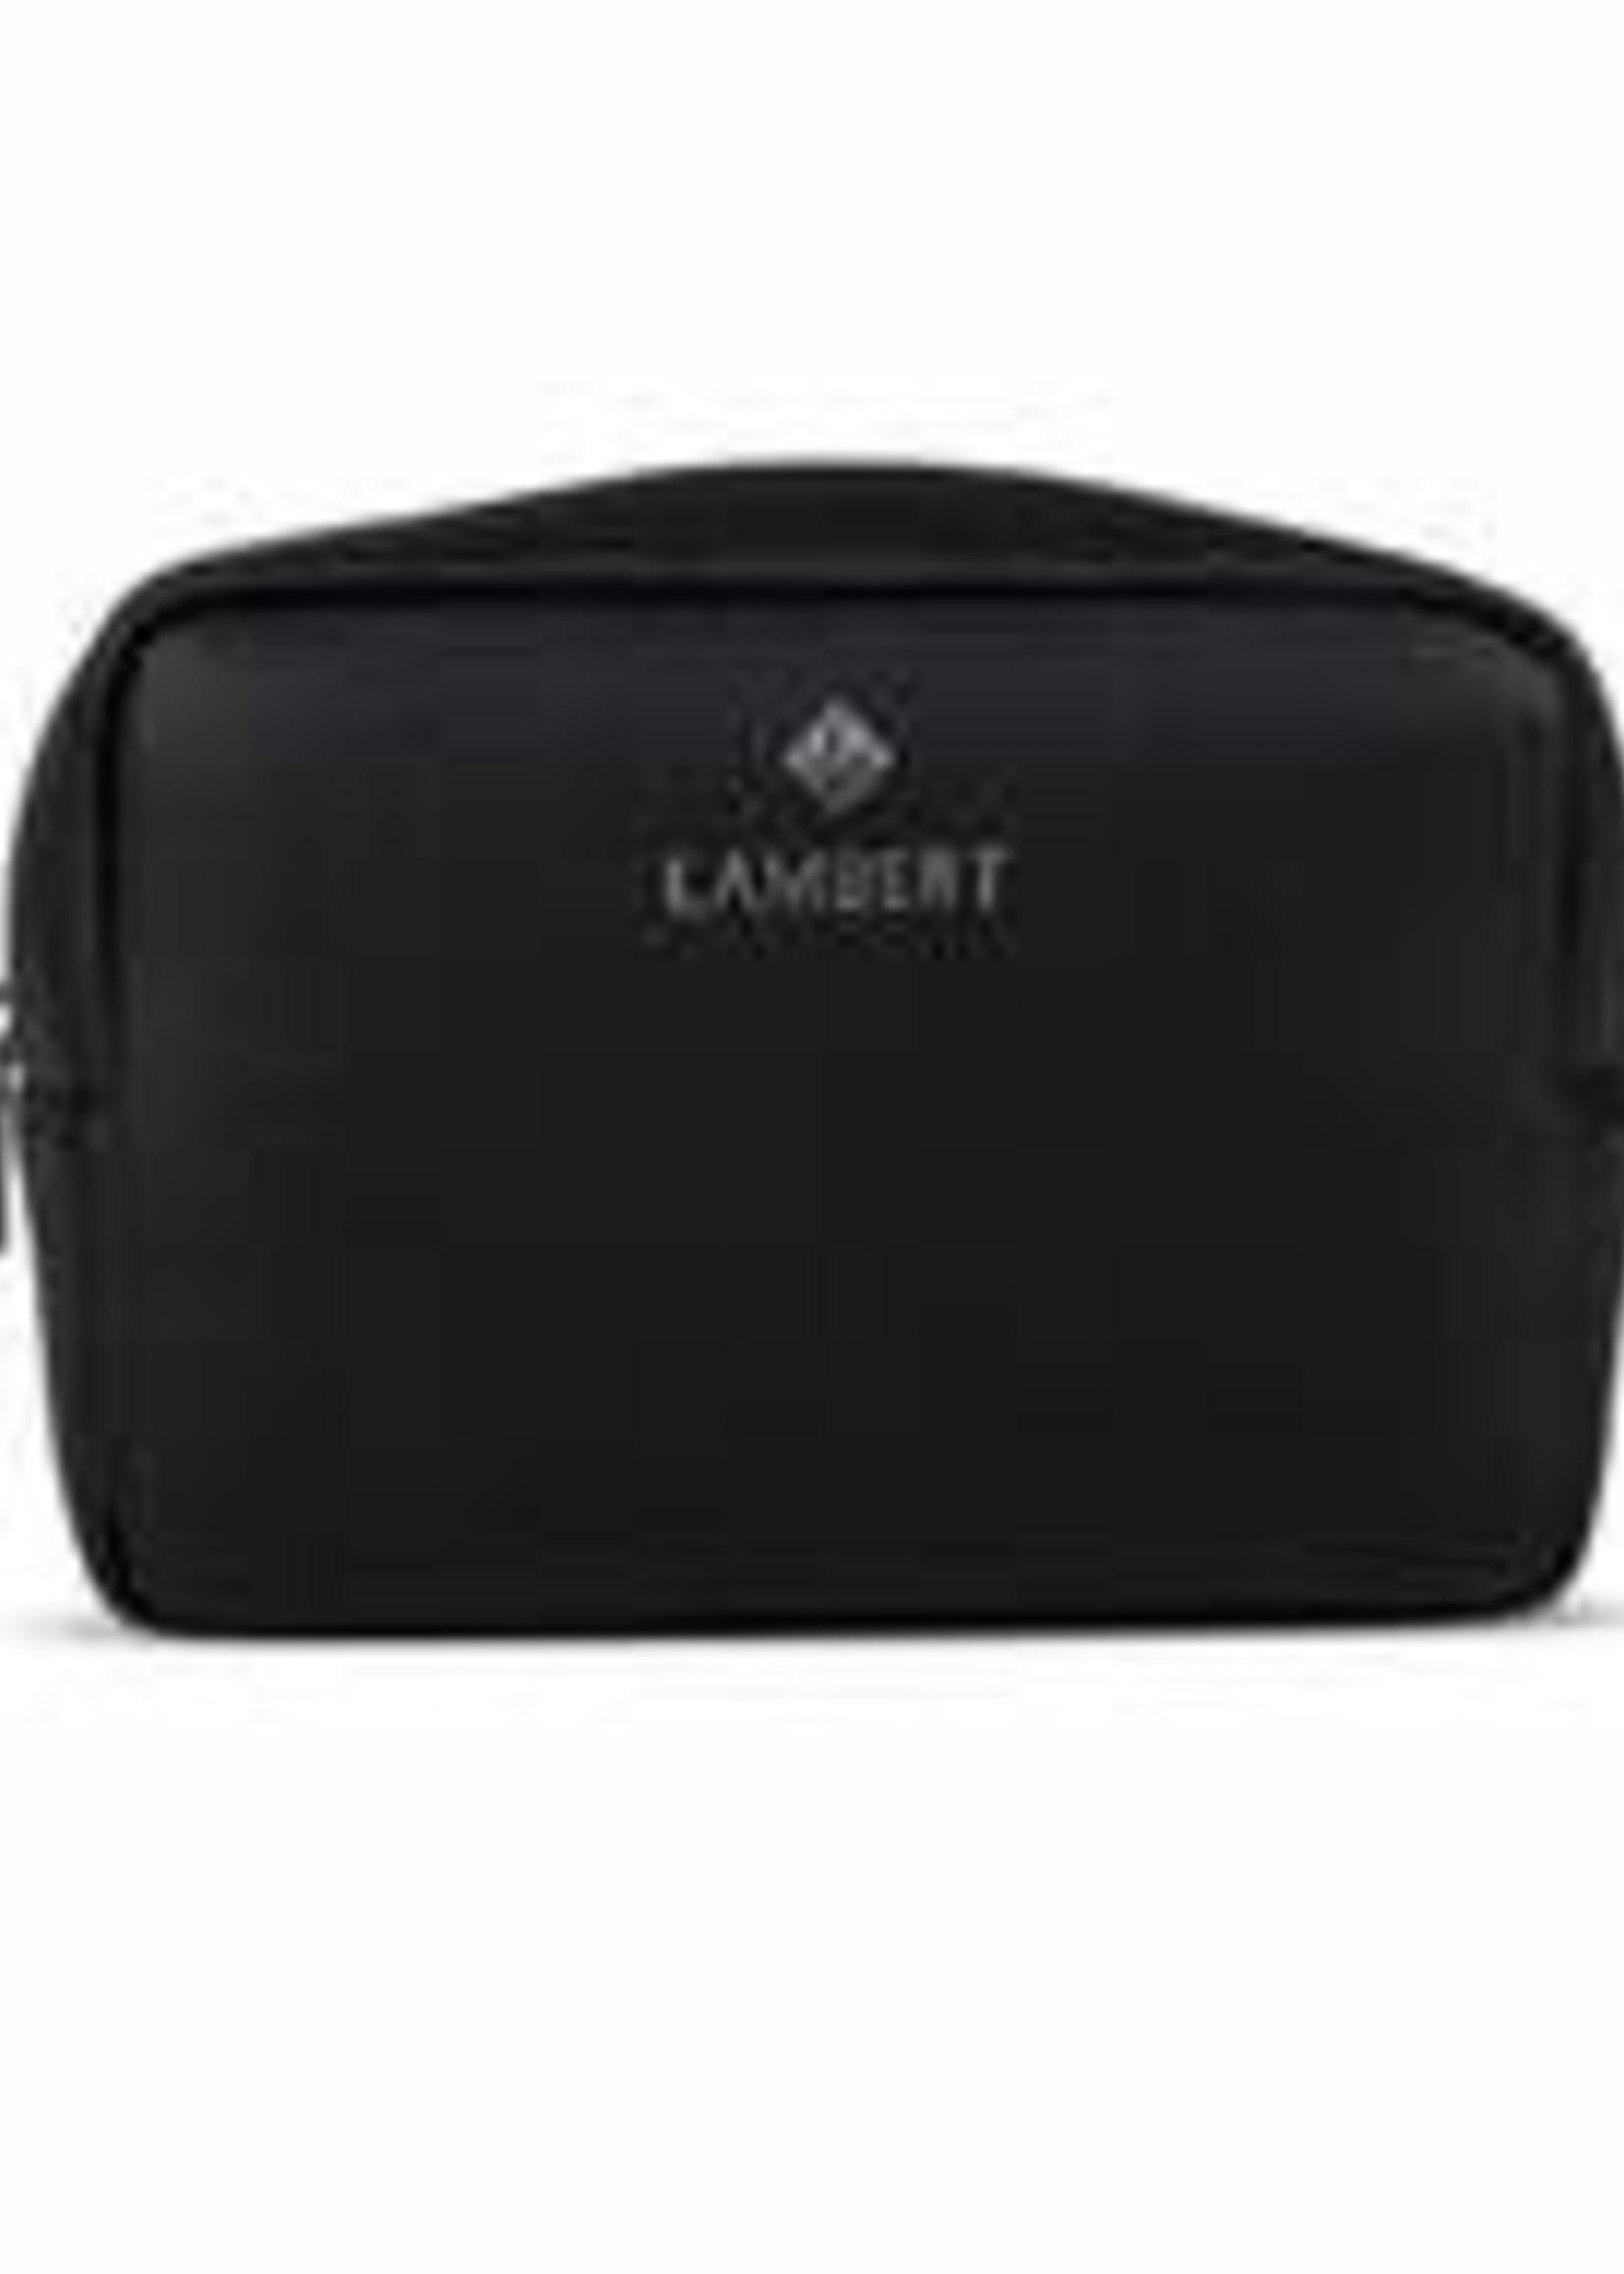 Lambert The ZOE - Vegan Leather Unisex Case